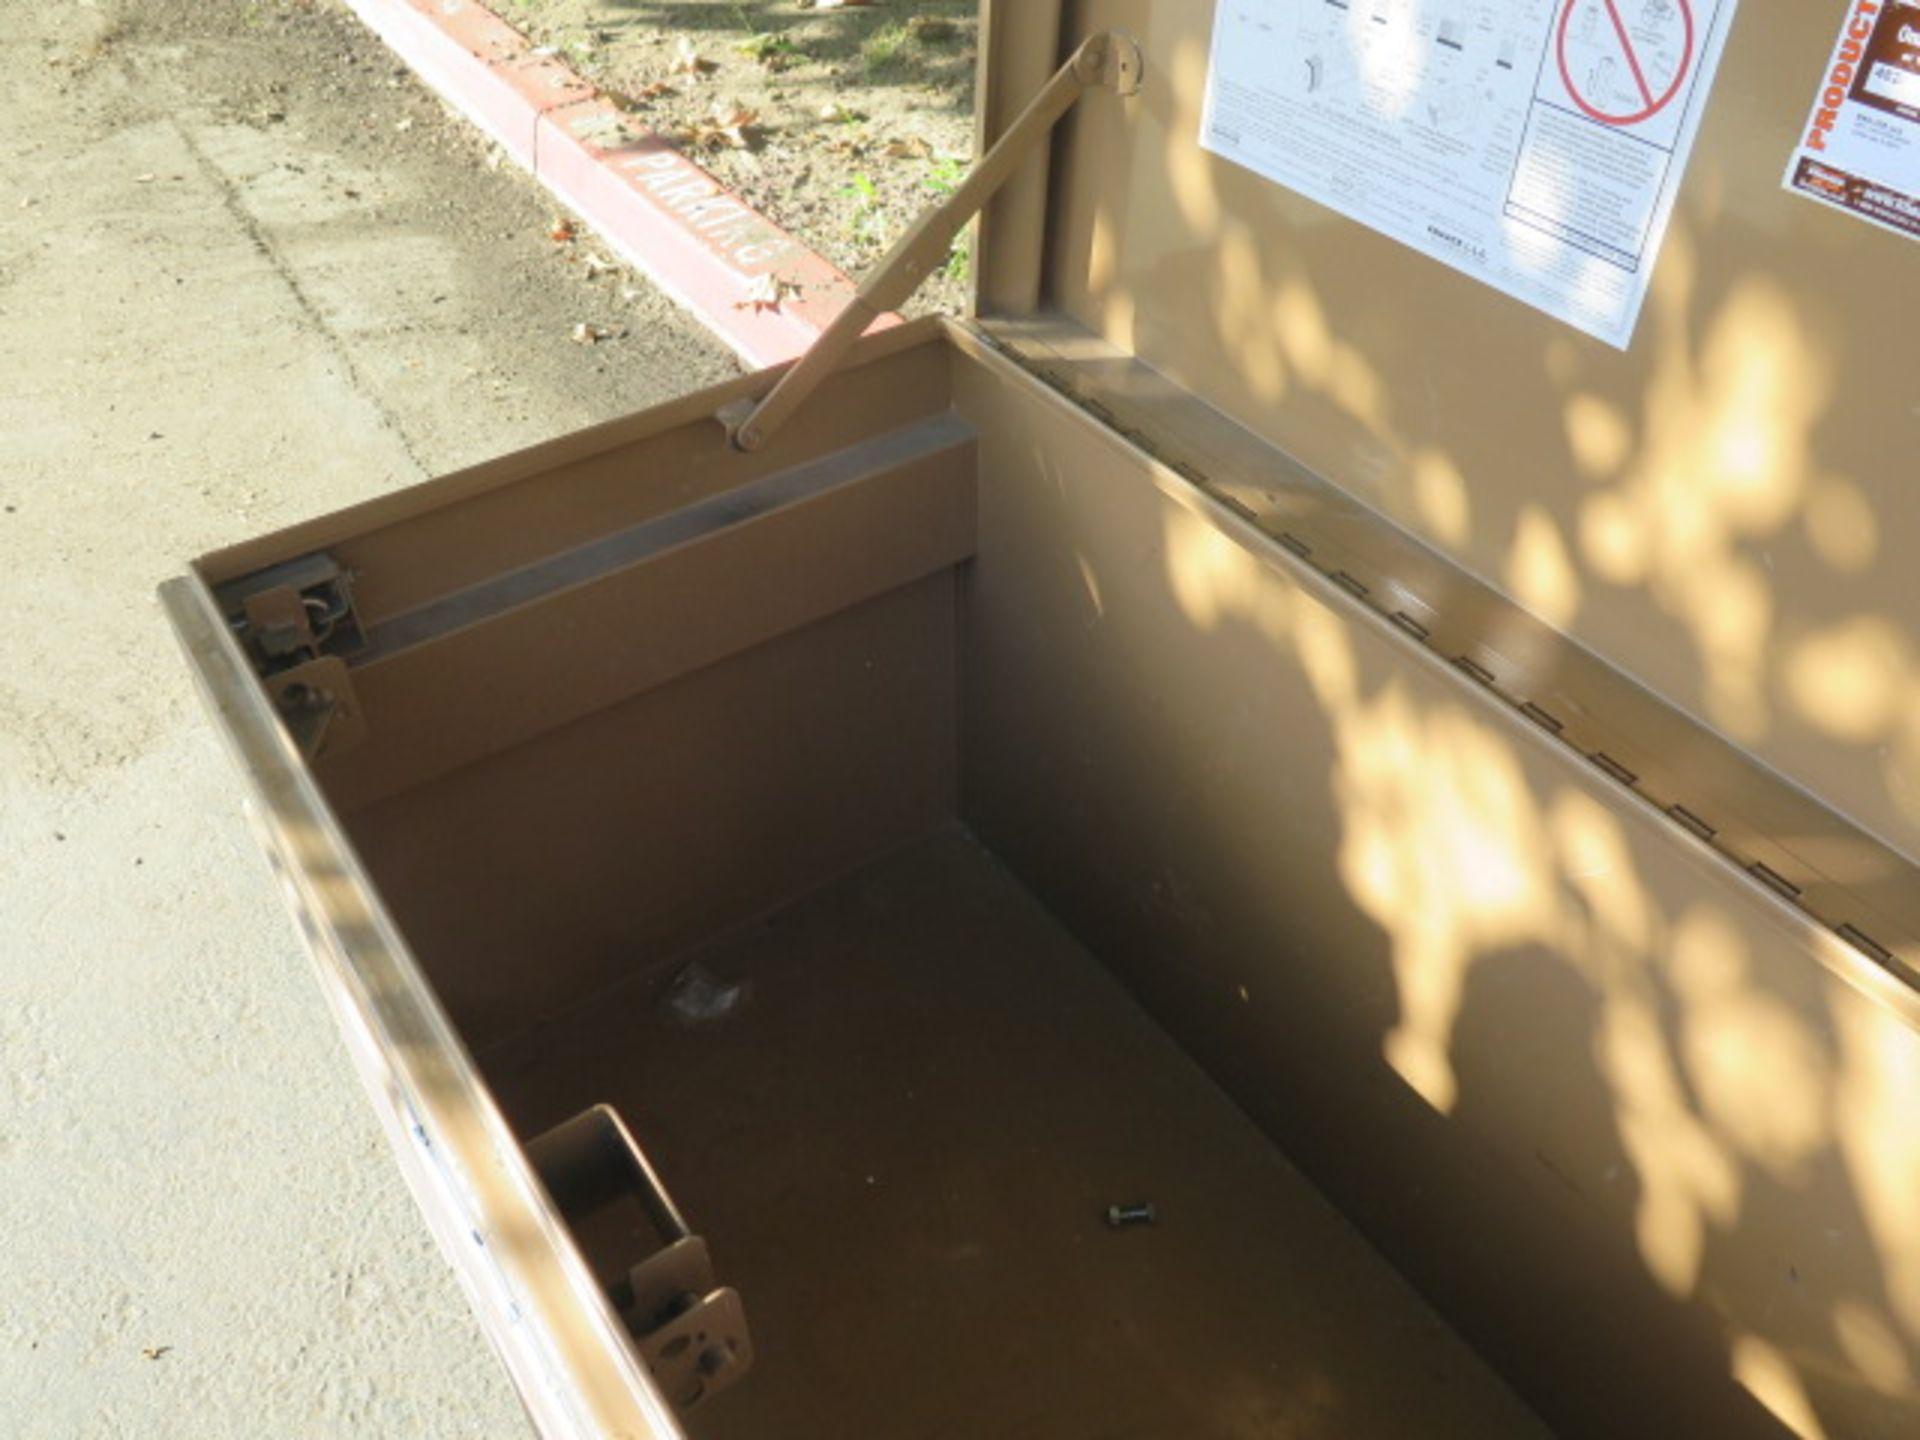 Knaack mdl. 4824 Rolling Job Box (SOLD AS-IS - NO WARRANTY) - Image 5 of 7